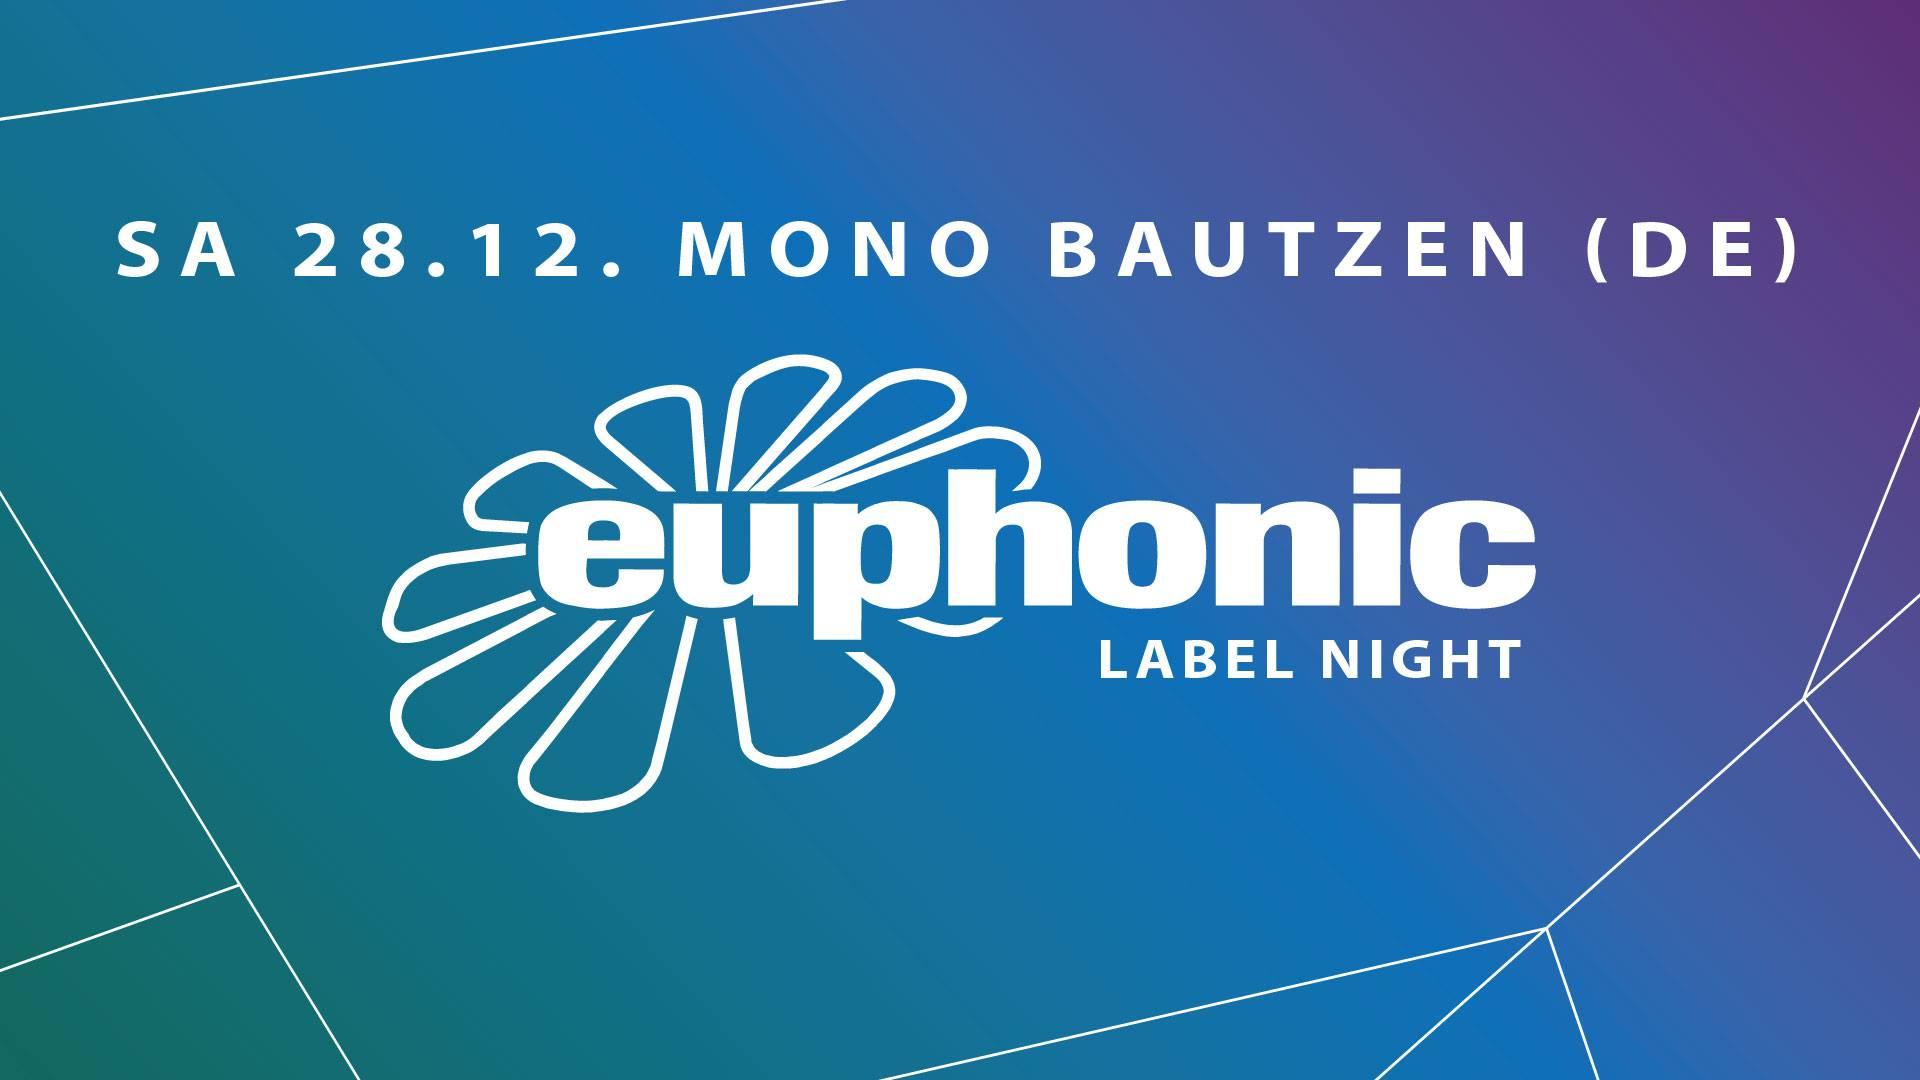 28.12.2019 Euphonic 300 Release Party, Bautzen